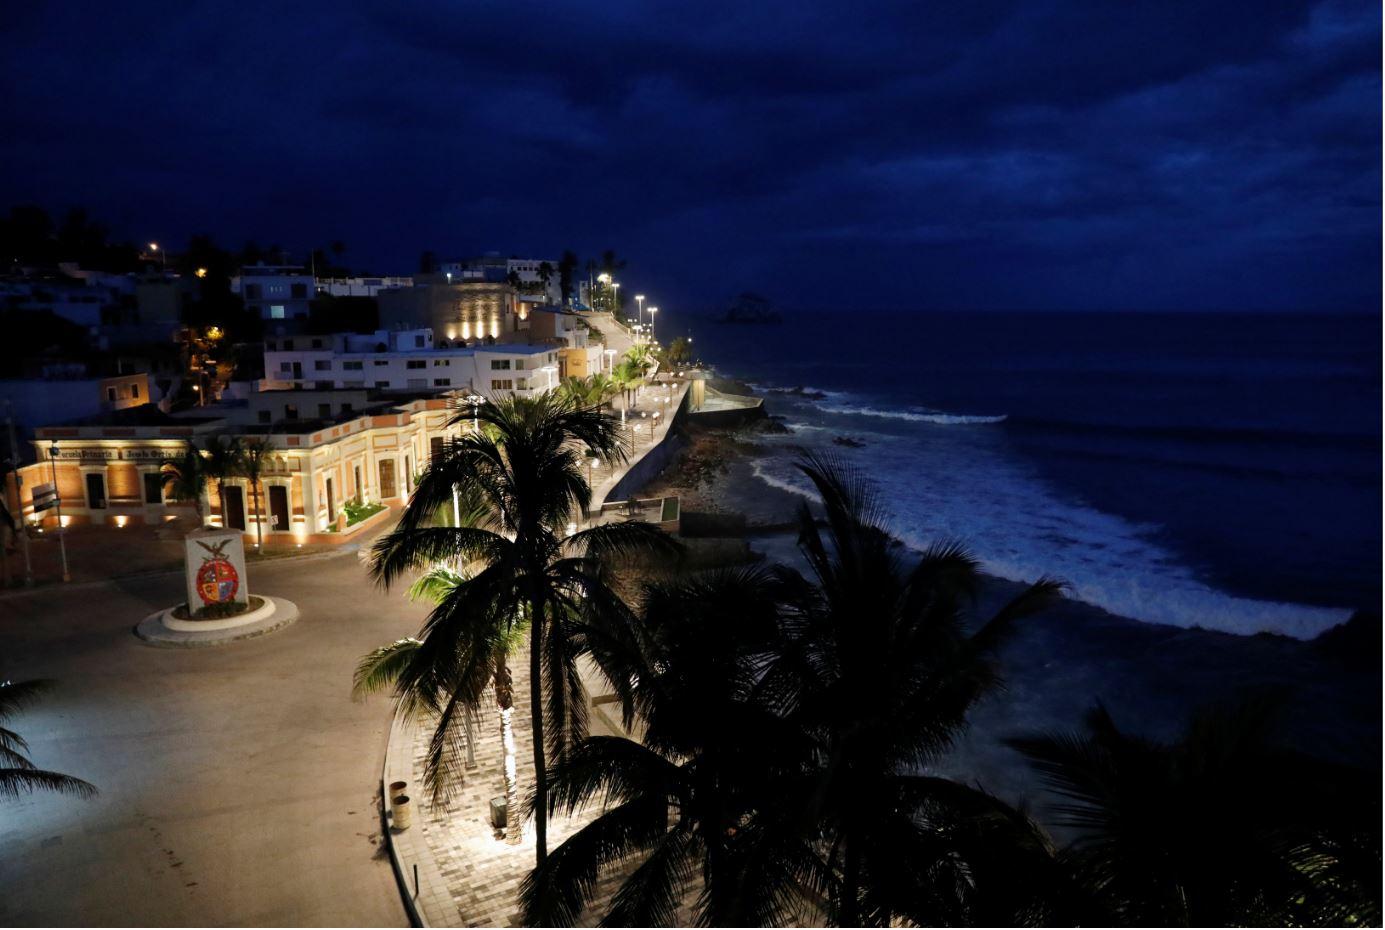 Hurricane Willa approaches the coast